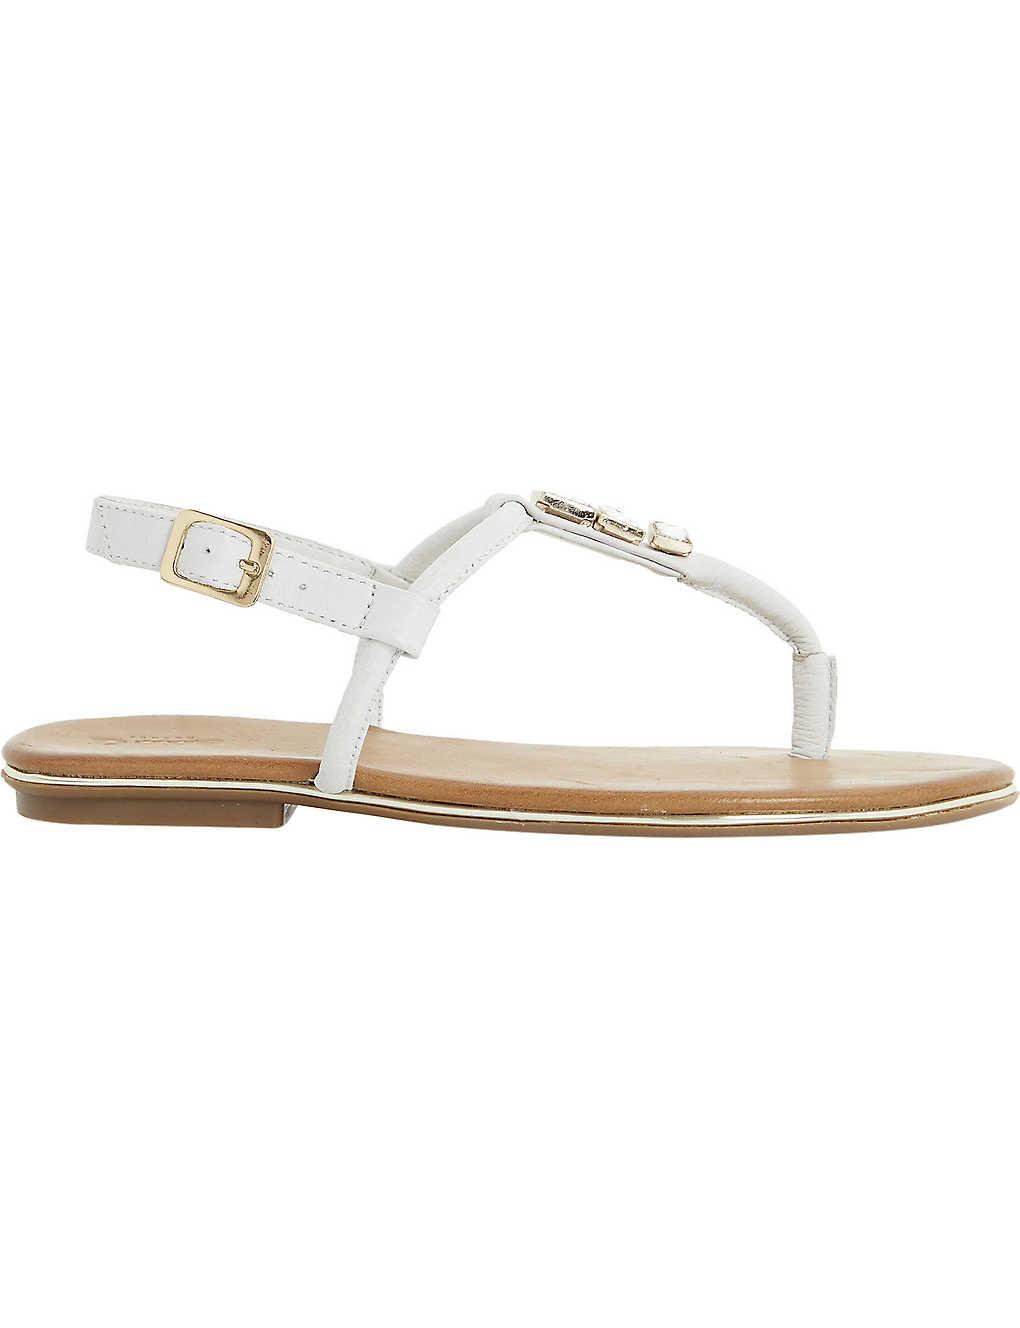 8b5d145b52d498 DUNE - Lilypad jewelled t-bar leather sandals